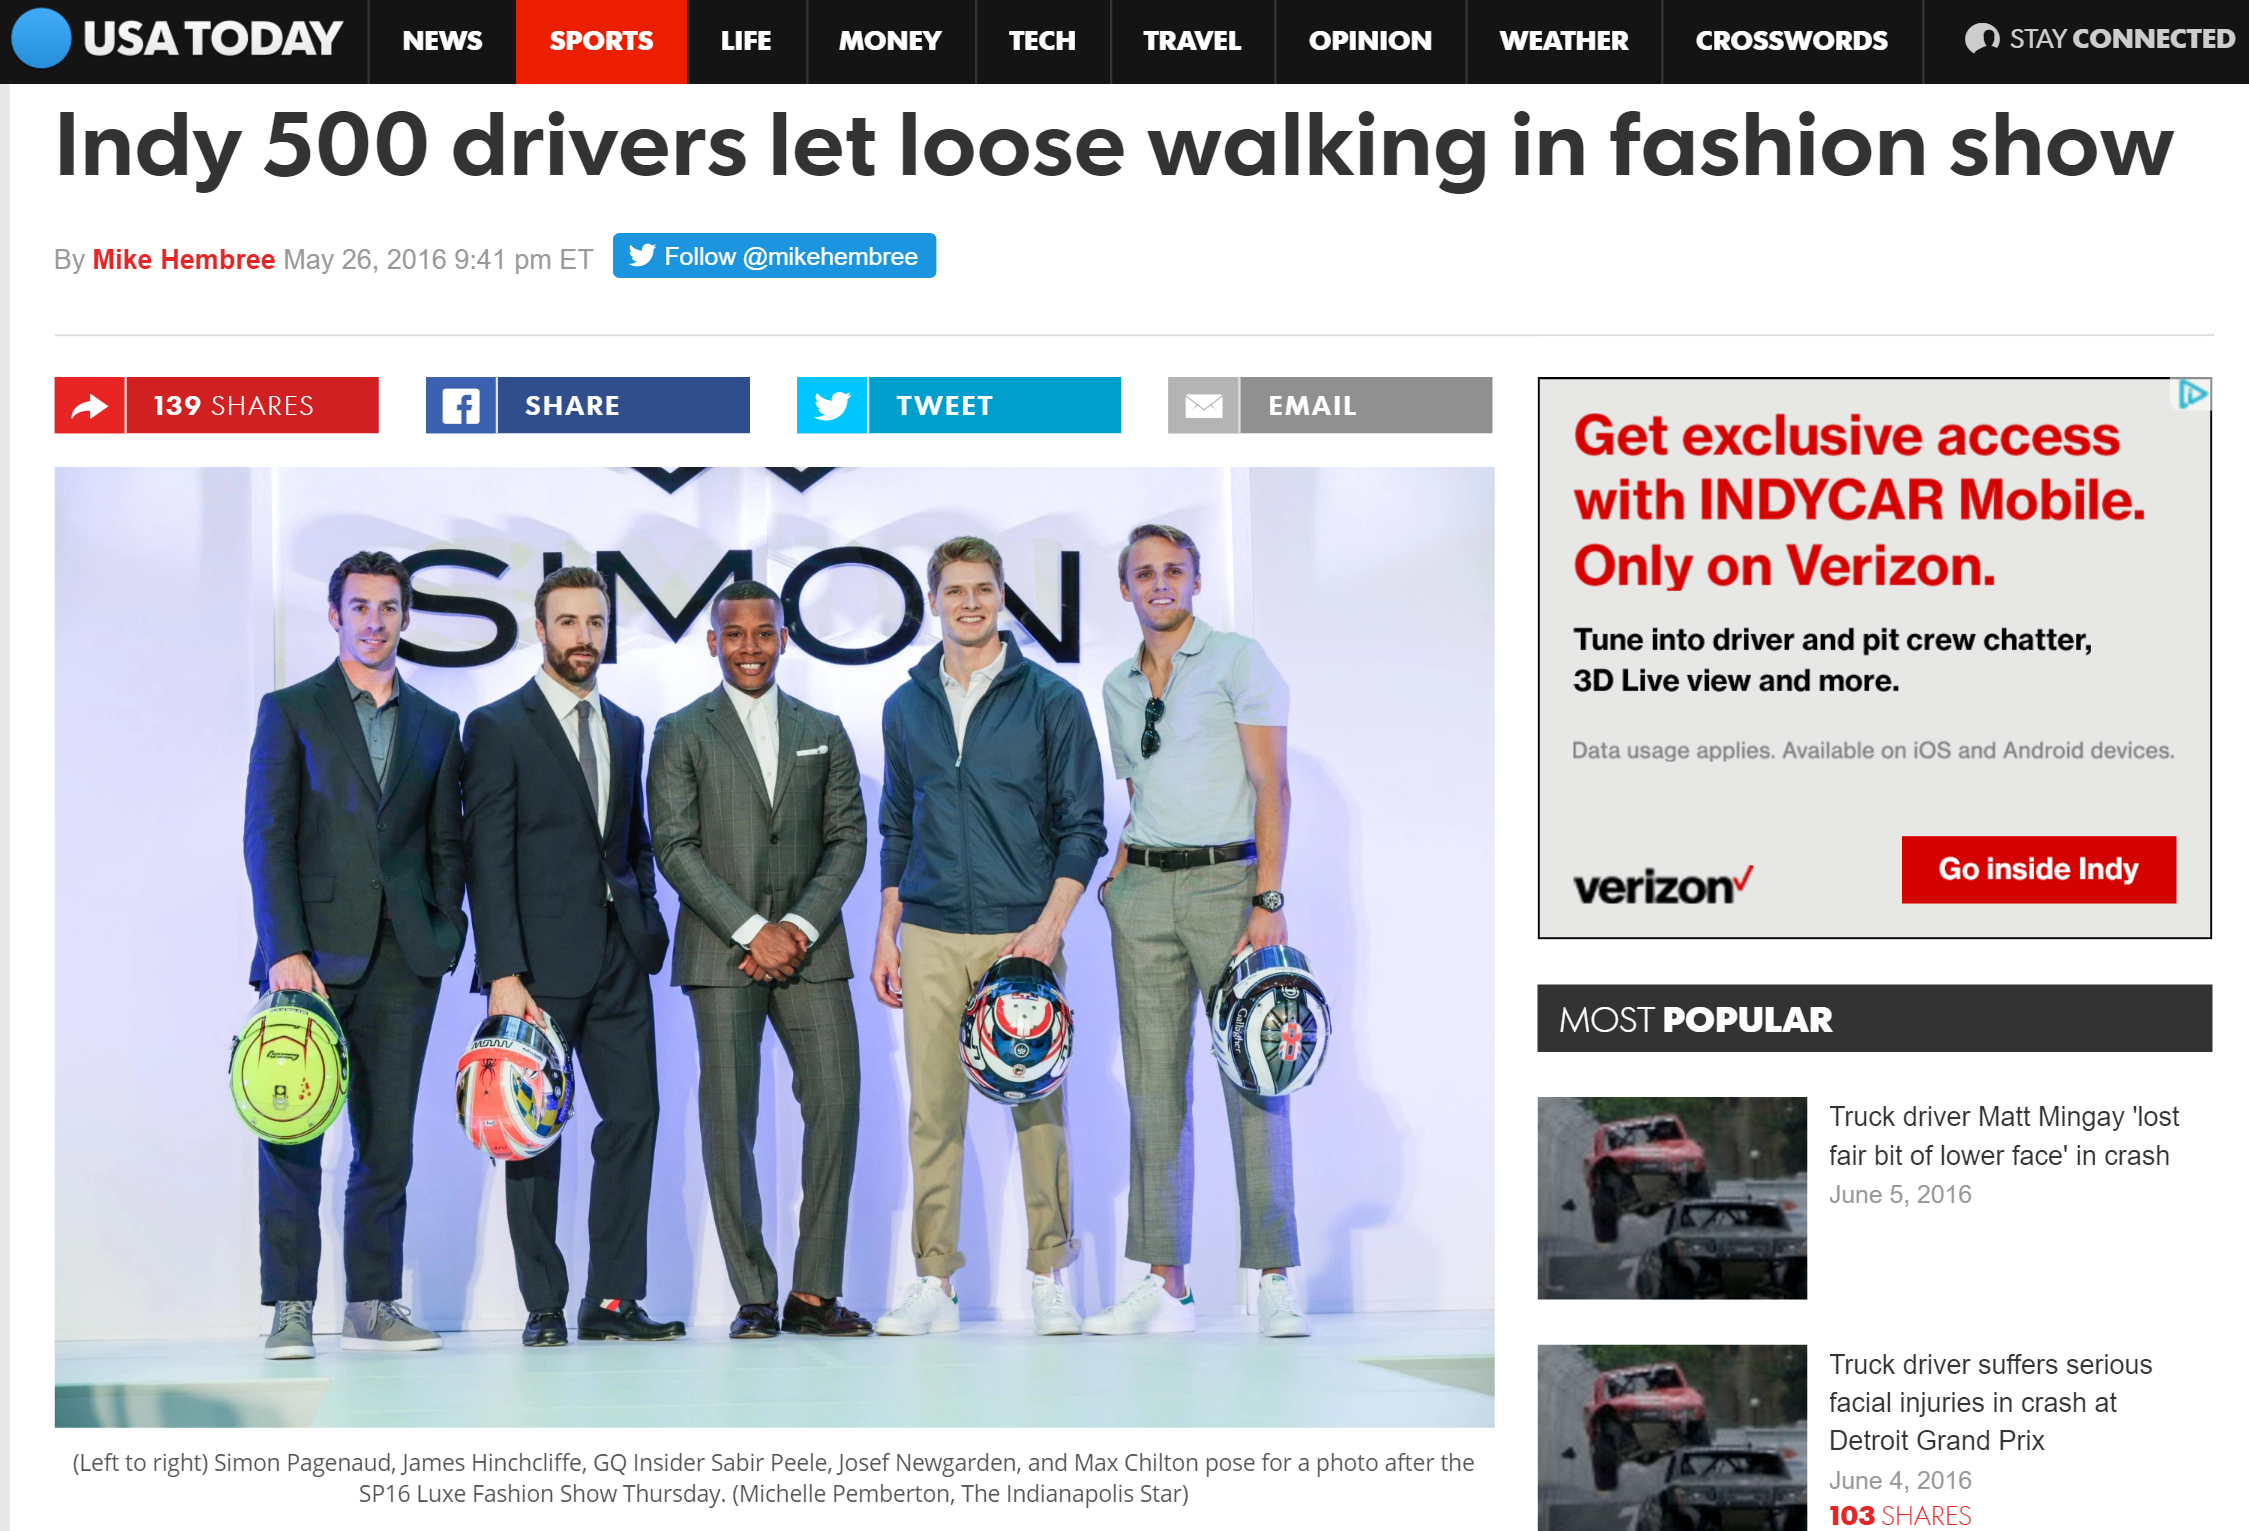 GQ Insider Sabir Peele Hosts Indy 500 Luxe Runway Show